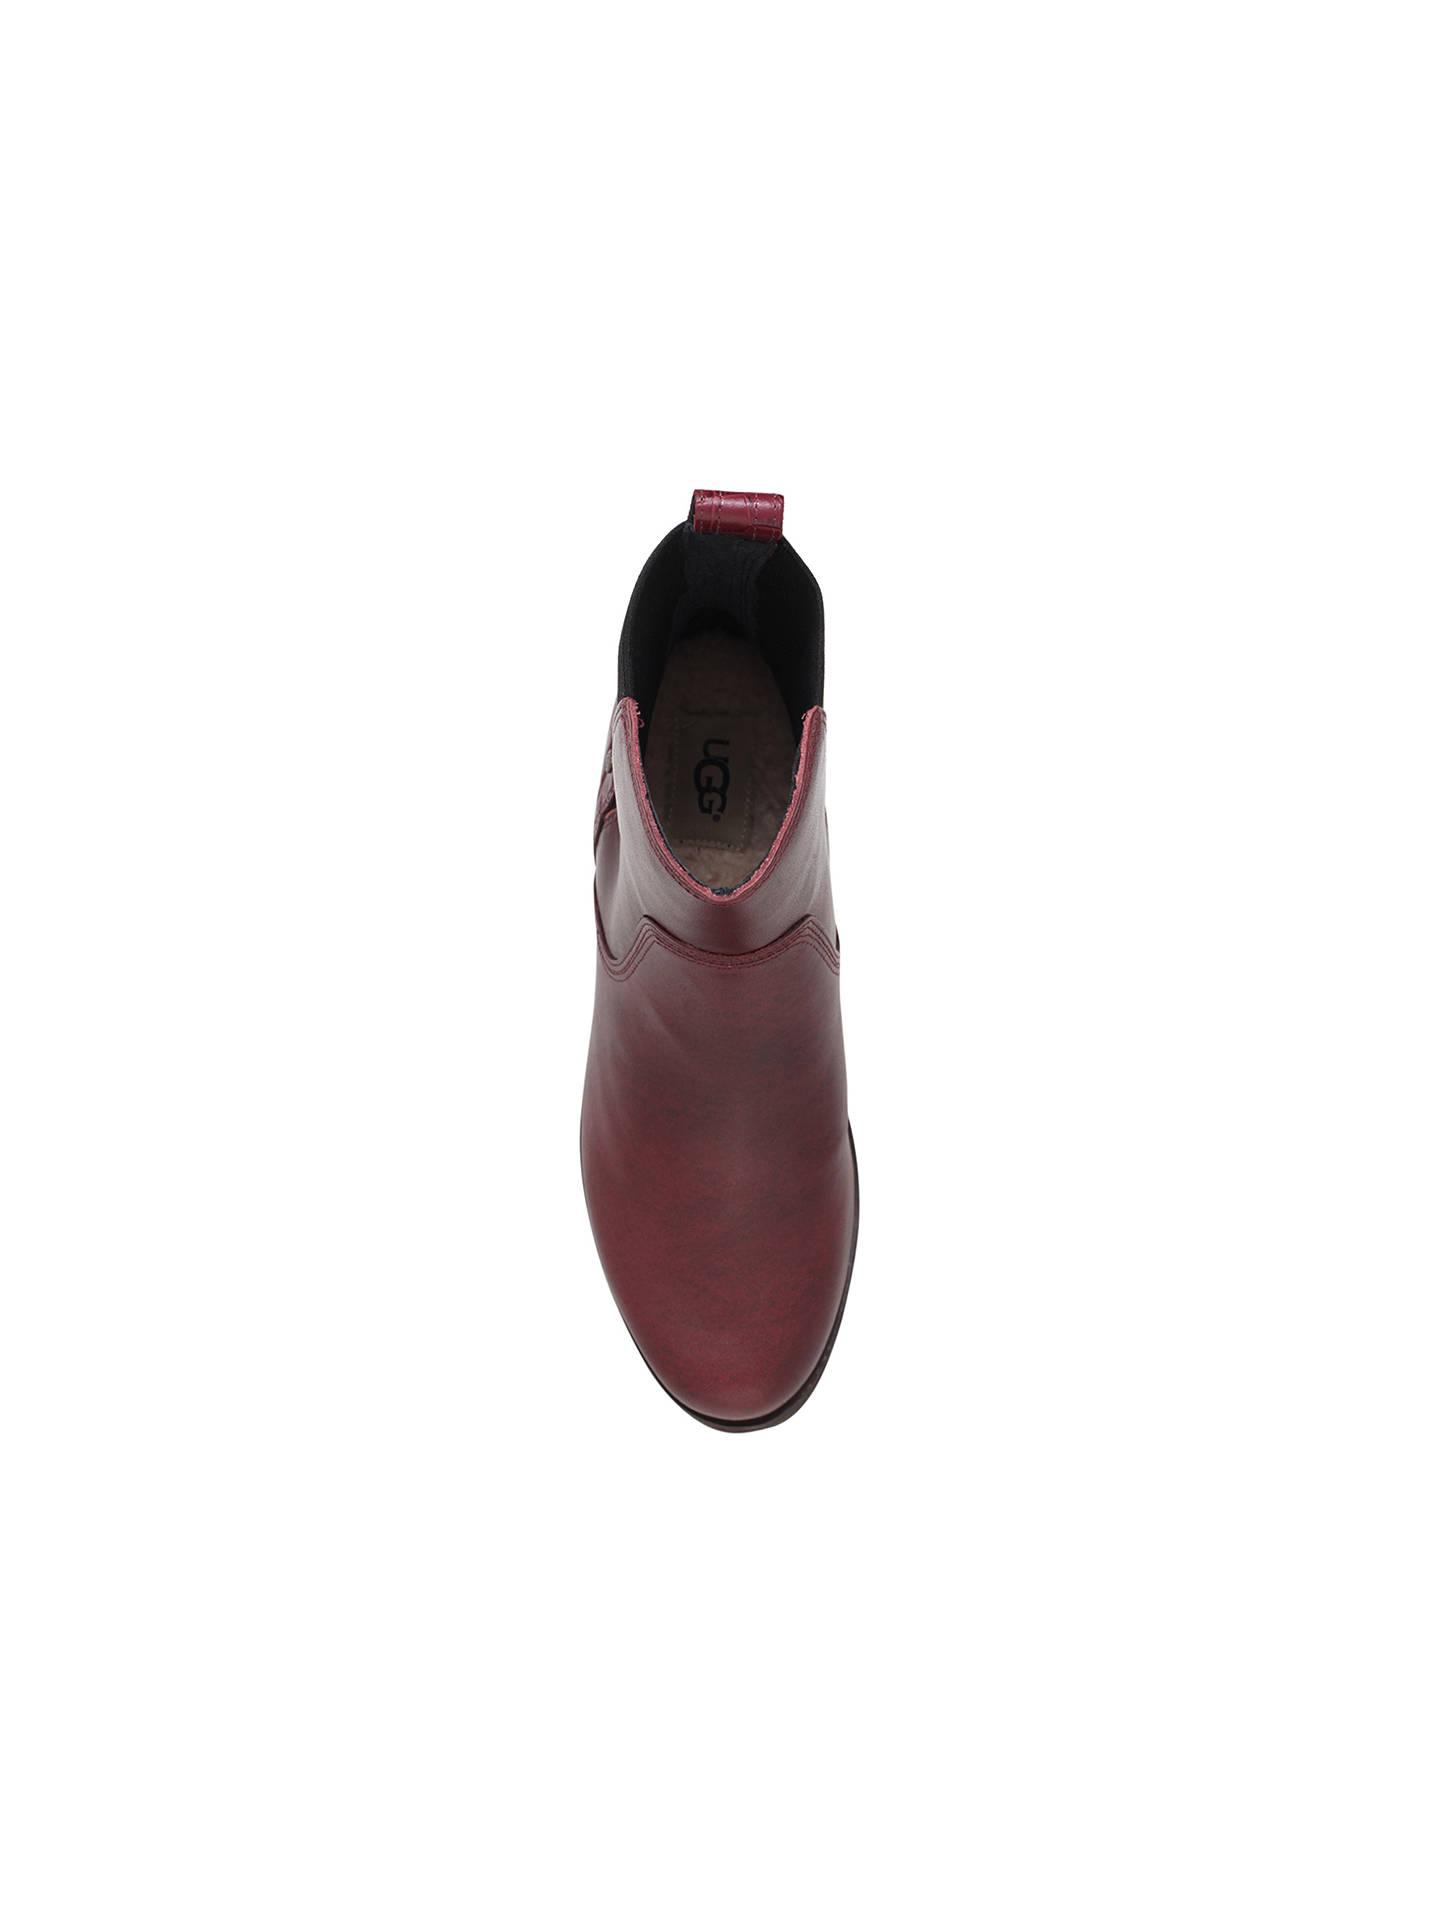 6f5b65a4bd4 UGG Keller Croc Ankle Boots at John Lewis & Partners